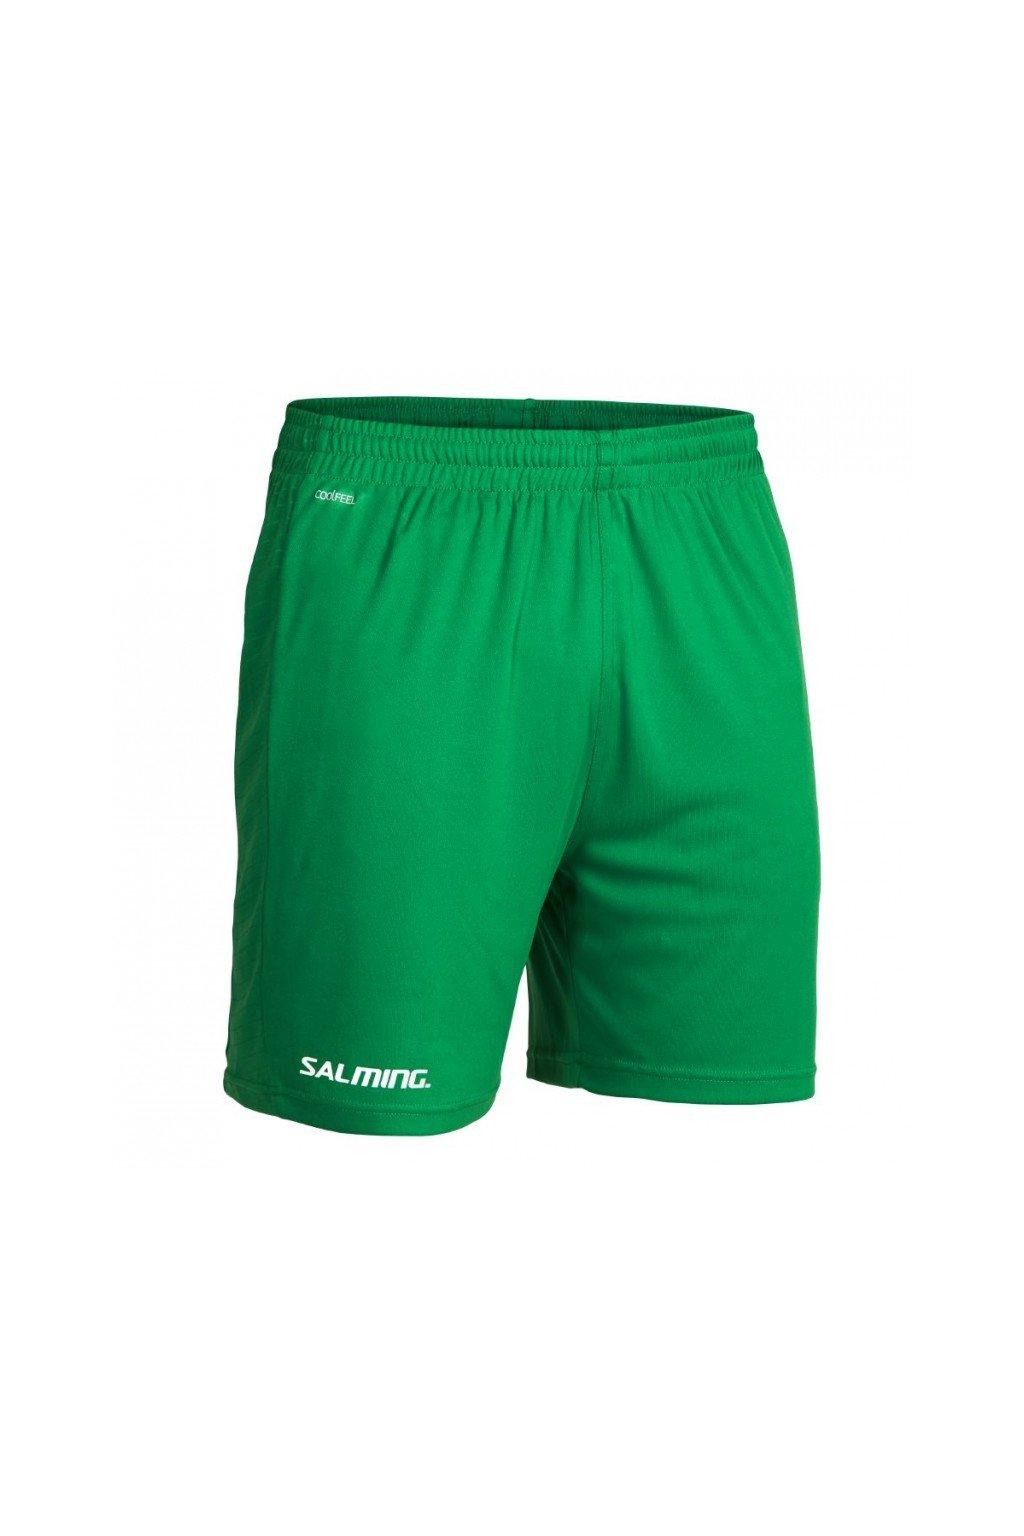 salming granite game shorts men green xxxl